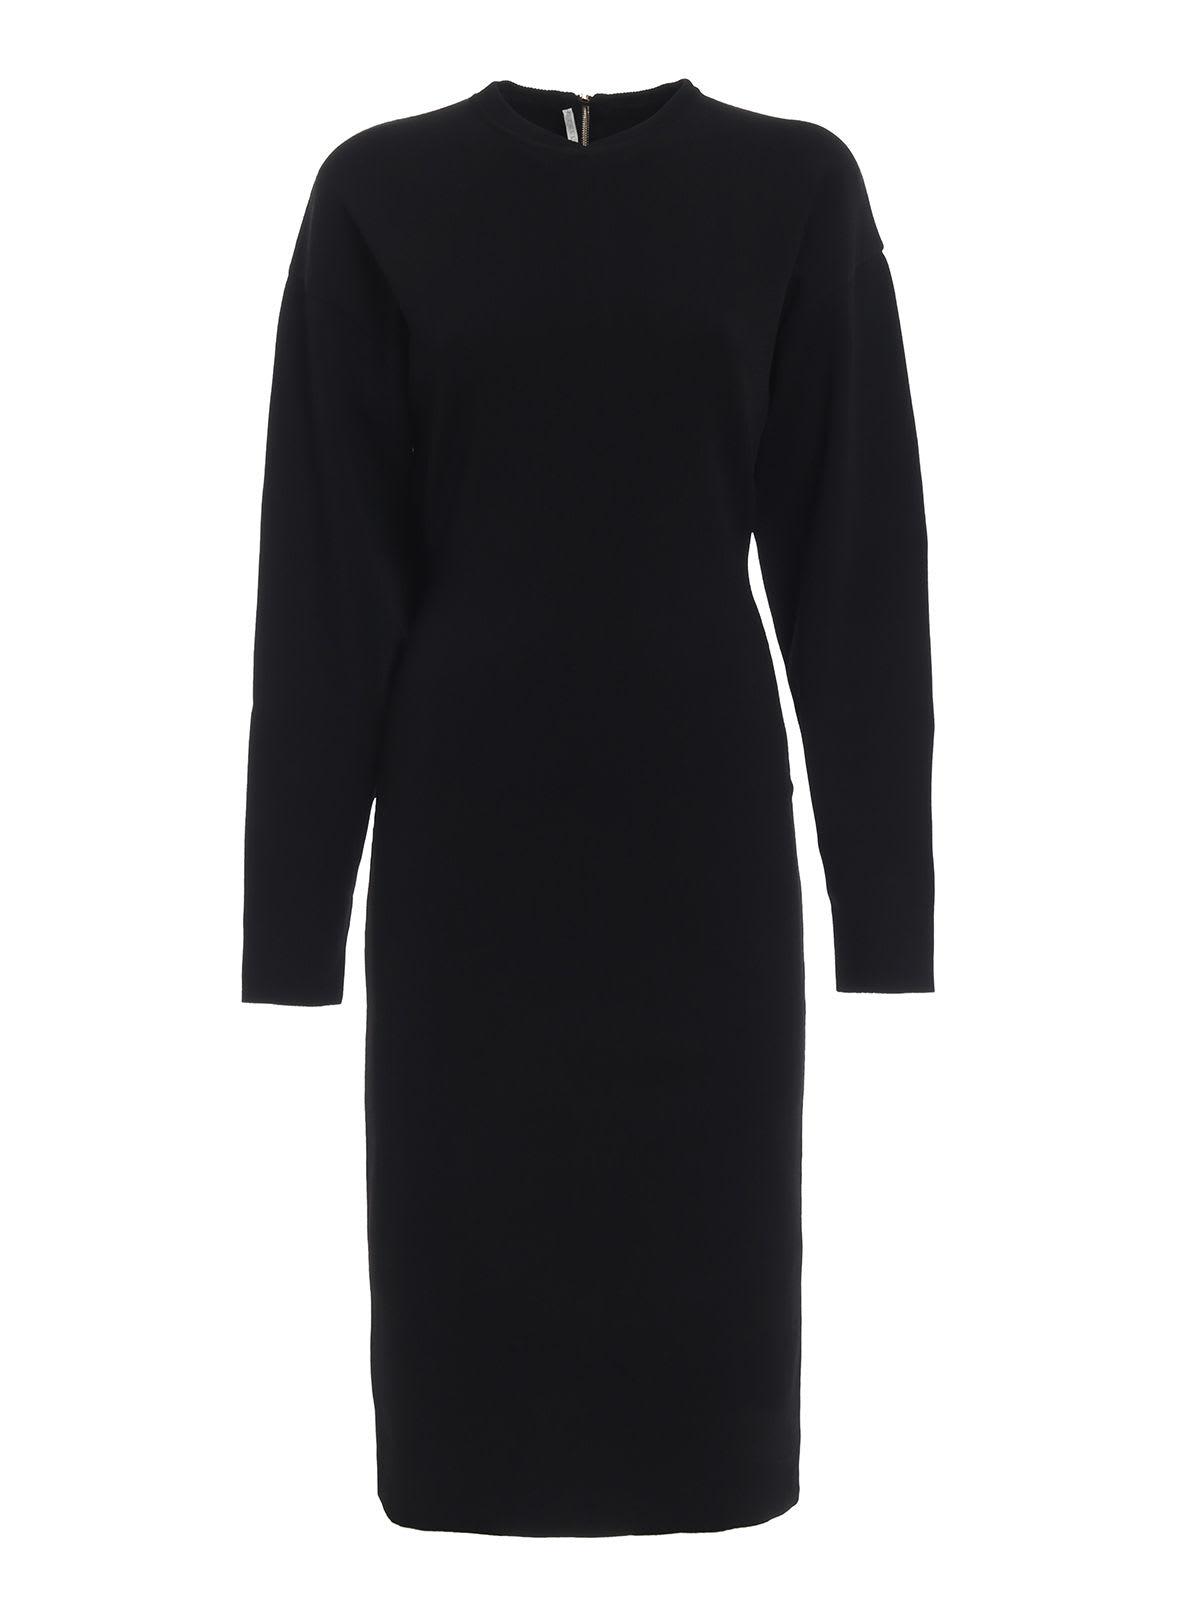 Stella McCartney Classic Dress